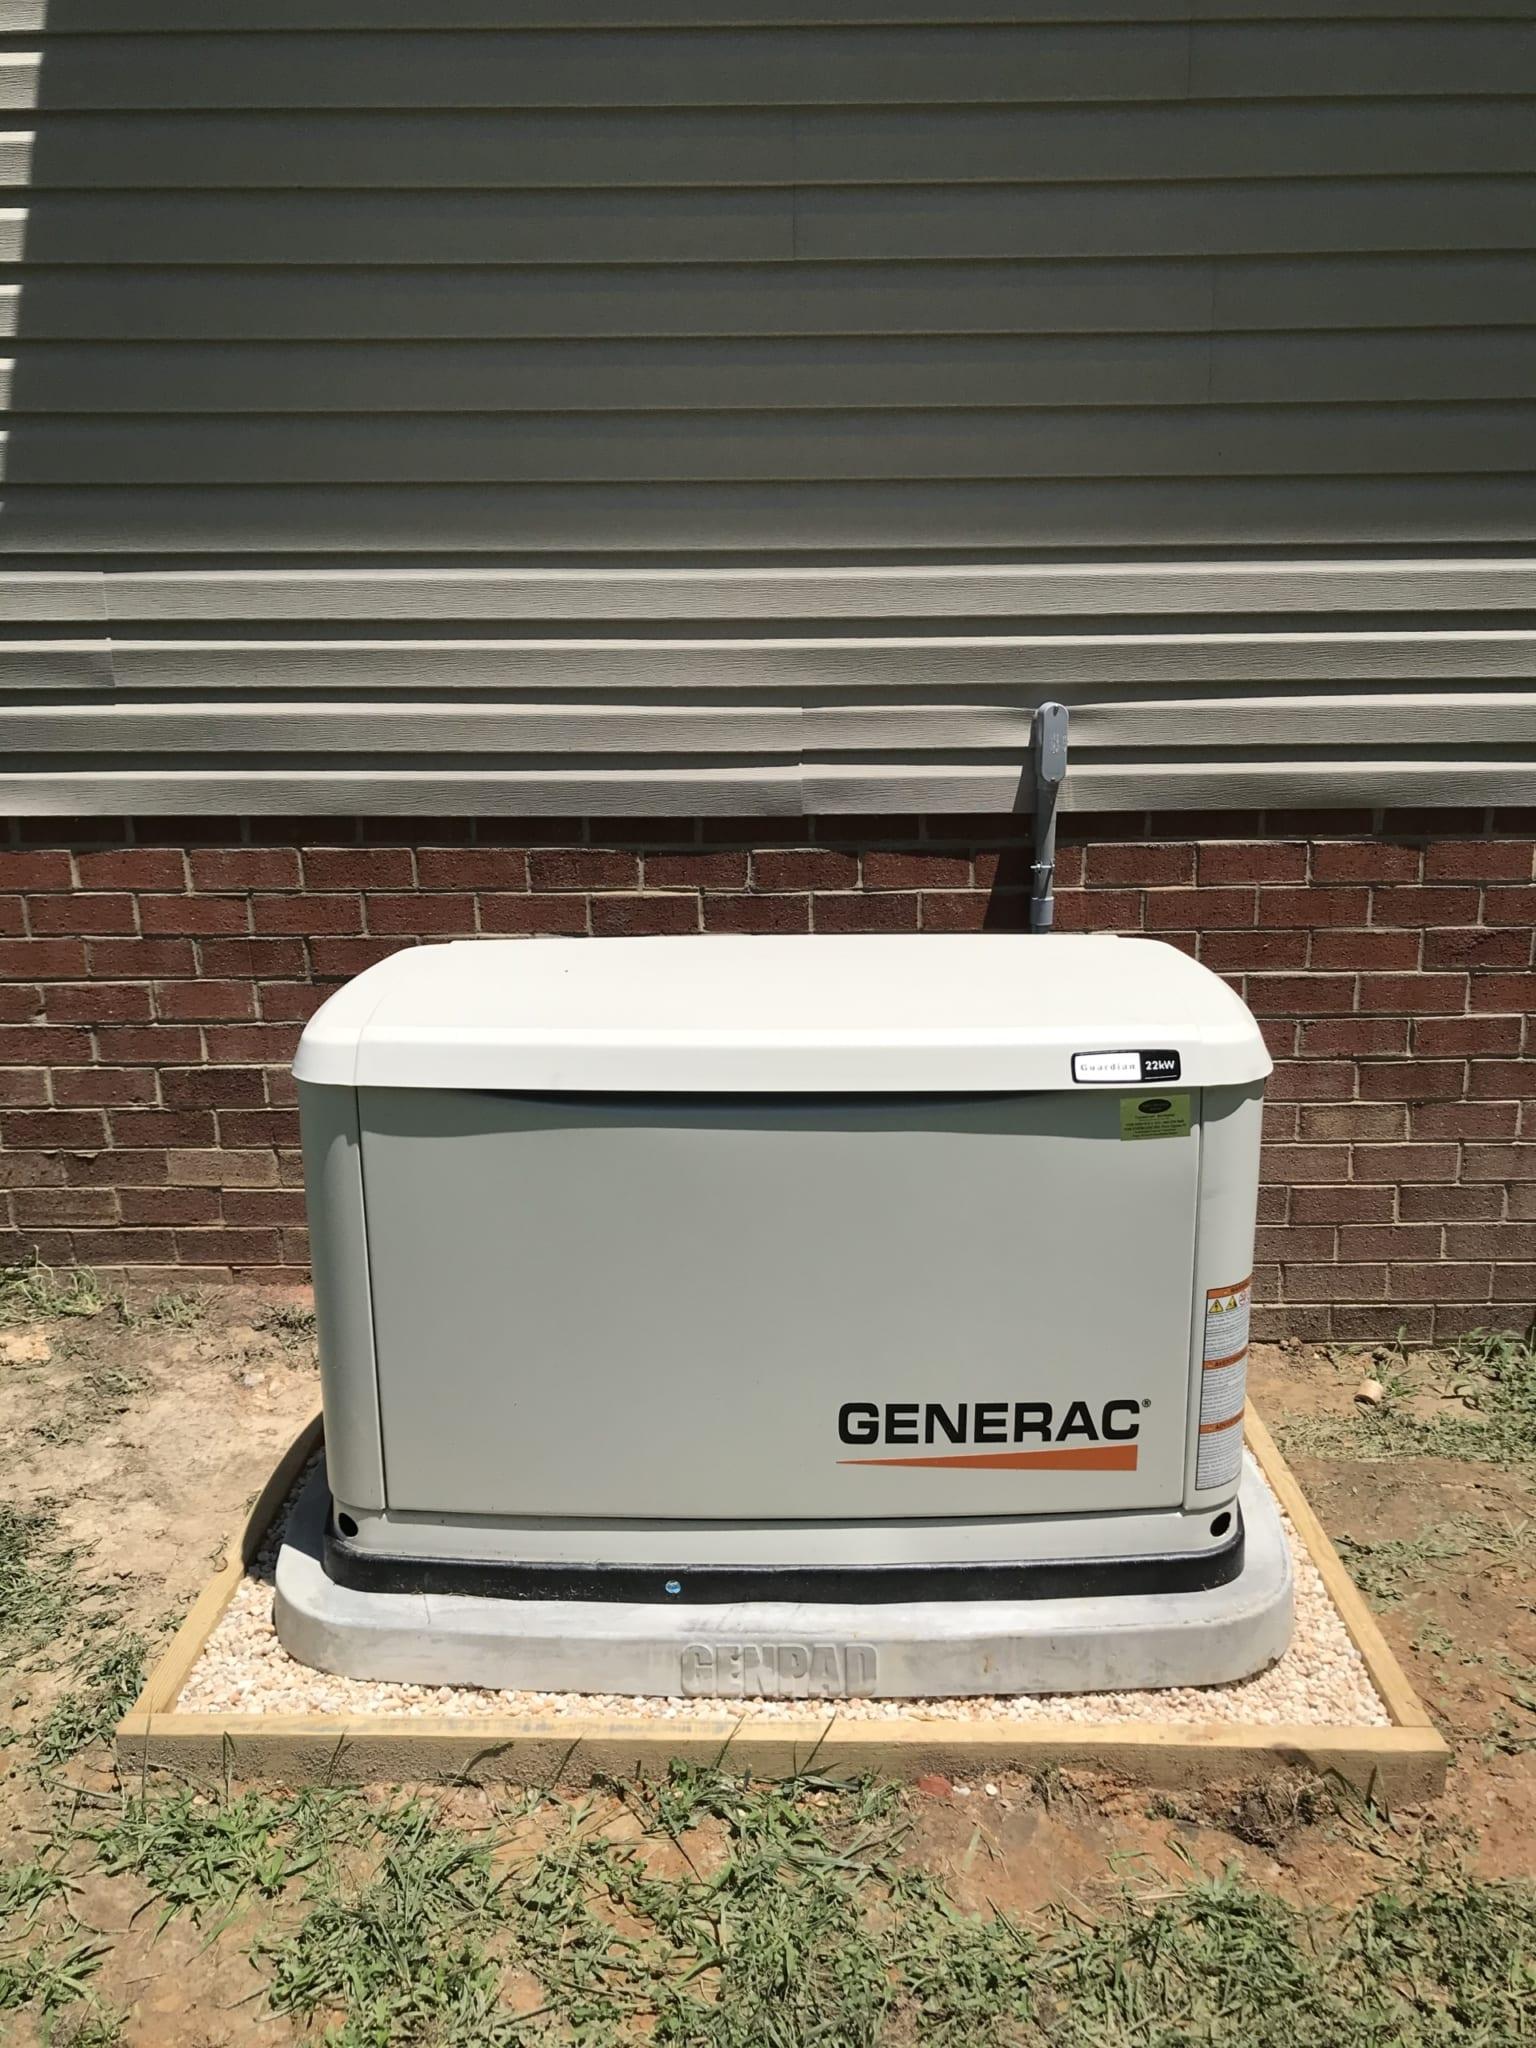 6.23.20 Chesterfield Generac Automatic Standby Generator